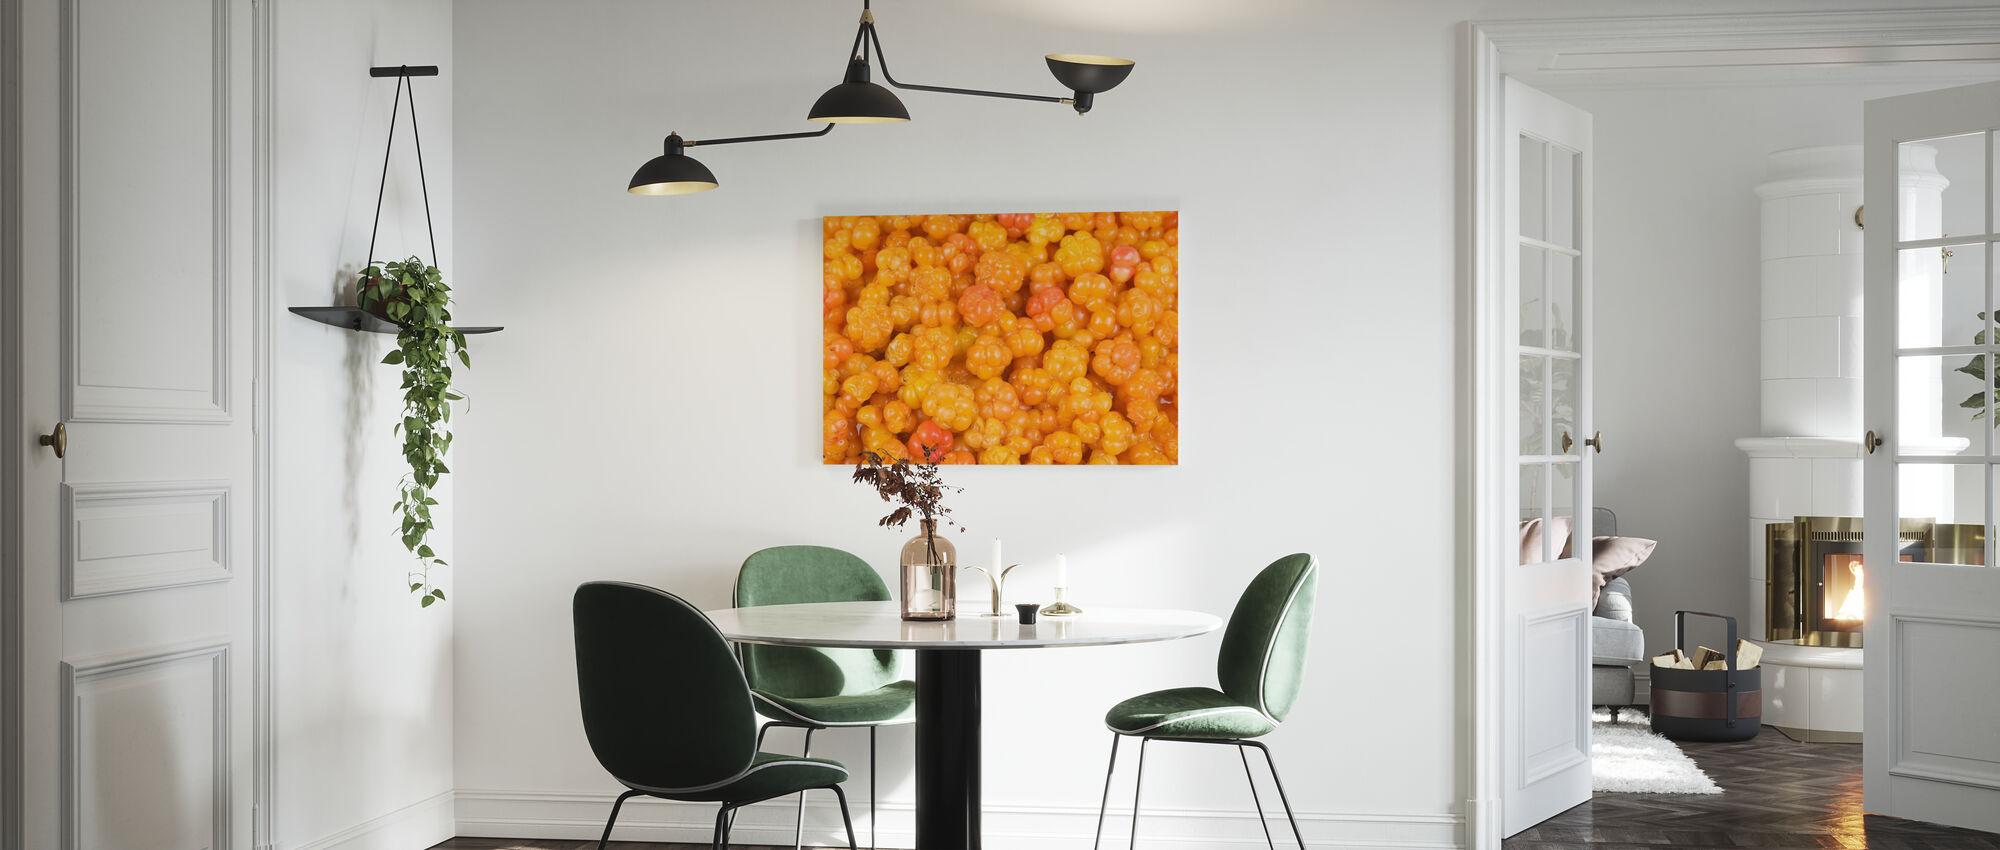 Cloudberry - Canvas print - Keuken